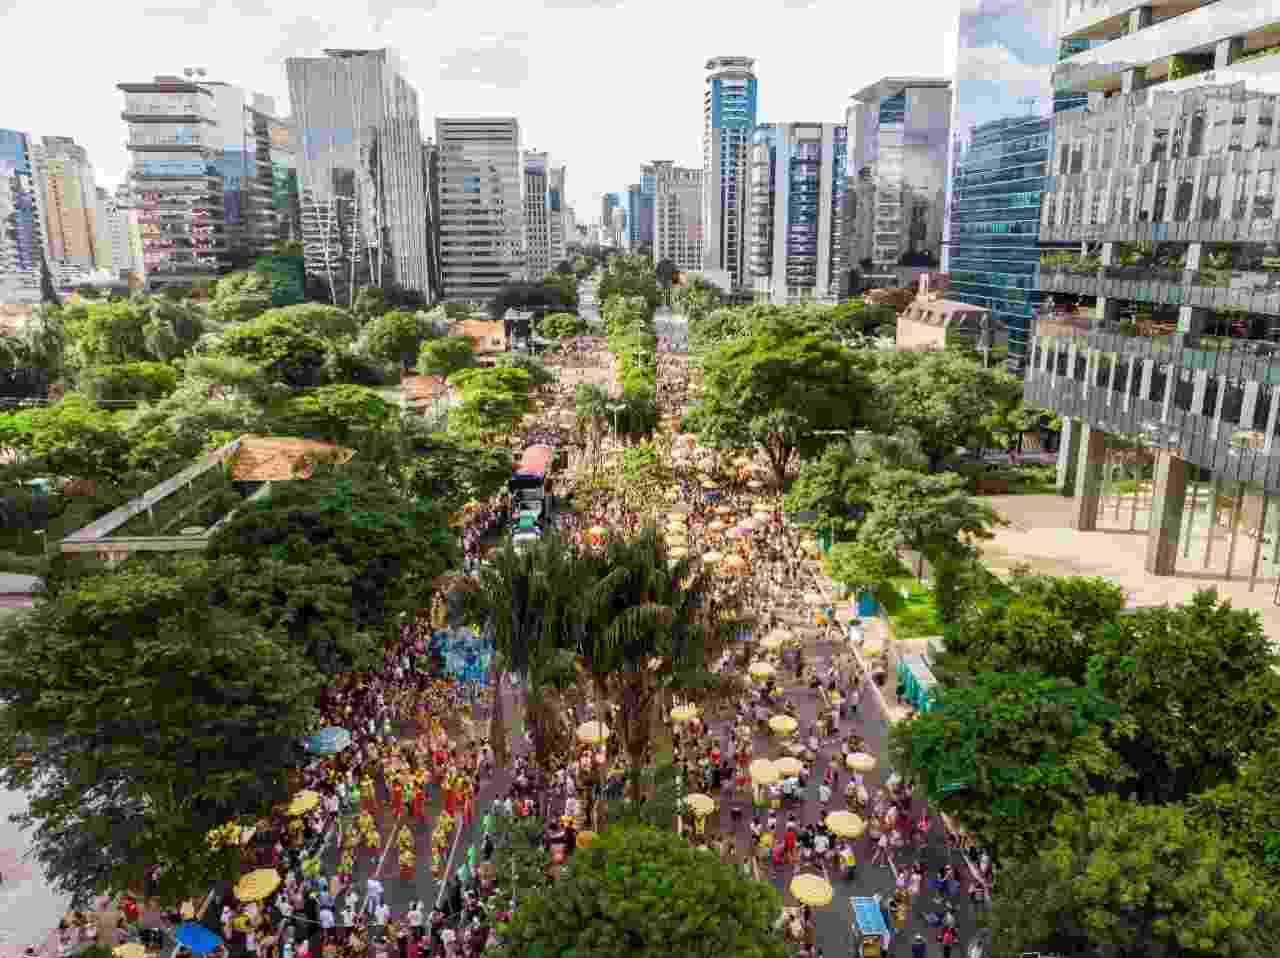 Bangalafumenga faz Carnaval inclusivo - Edson Lopes Jr./UOL